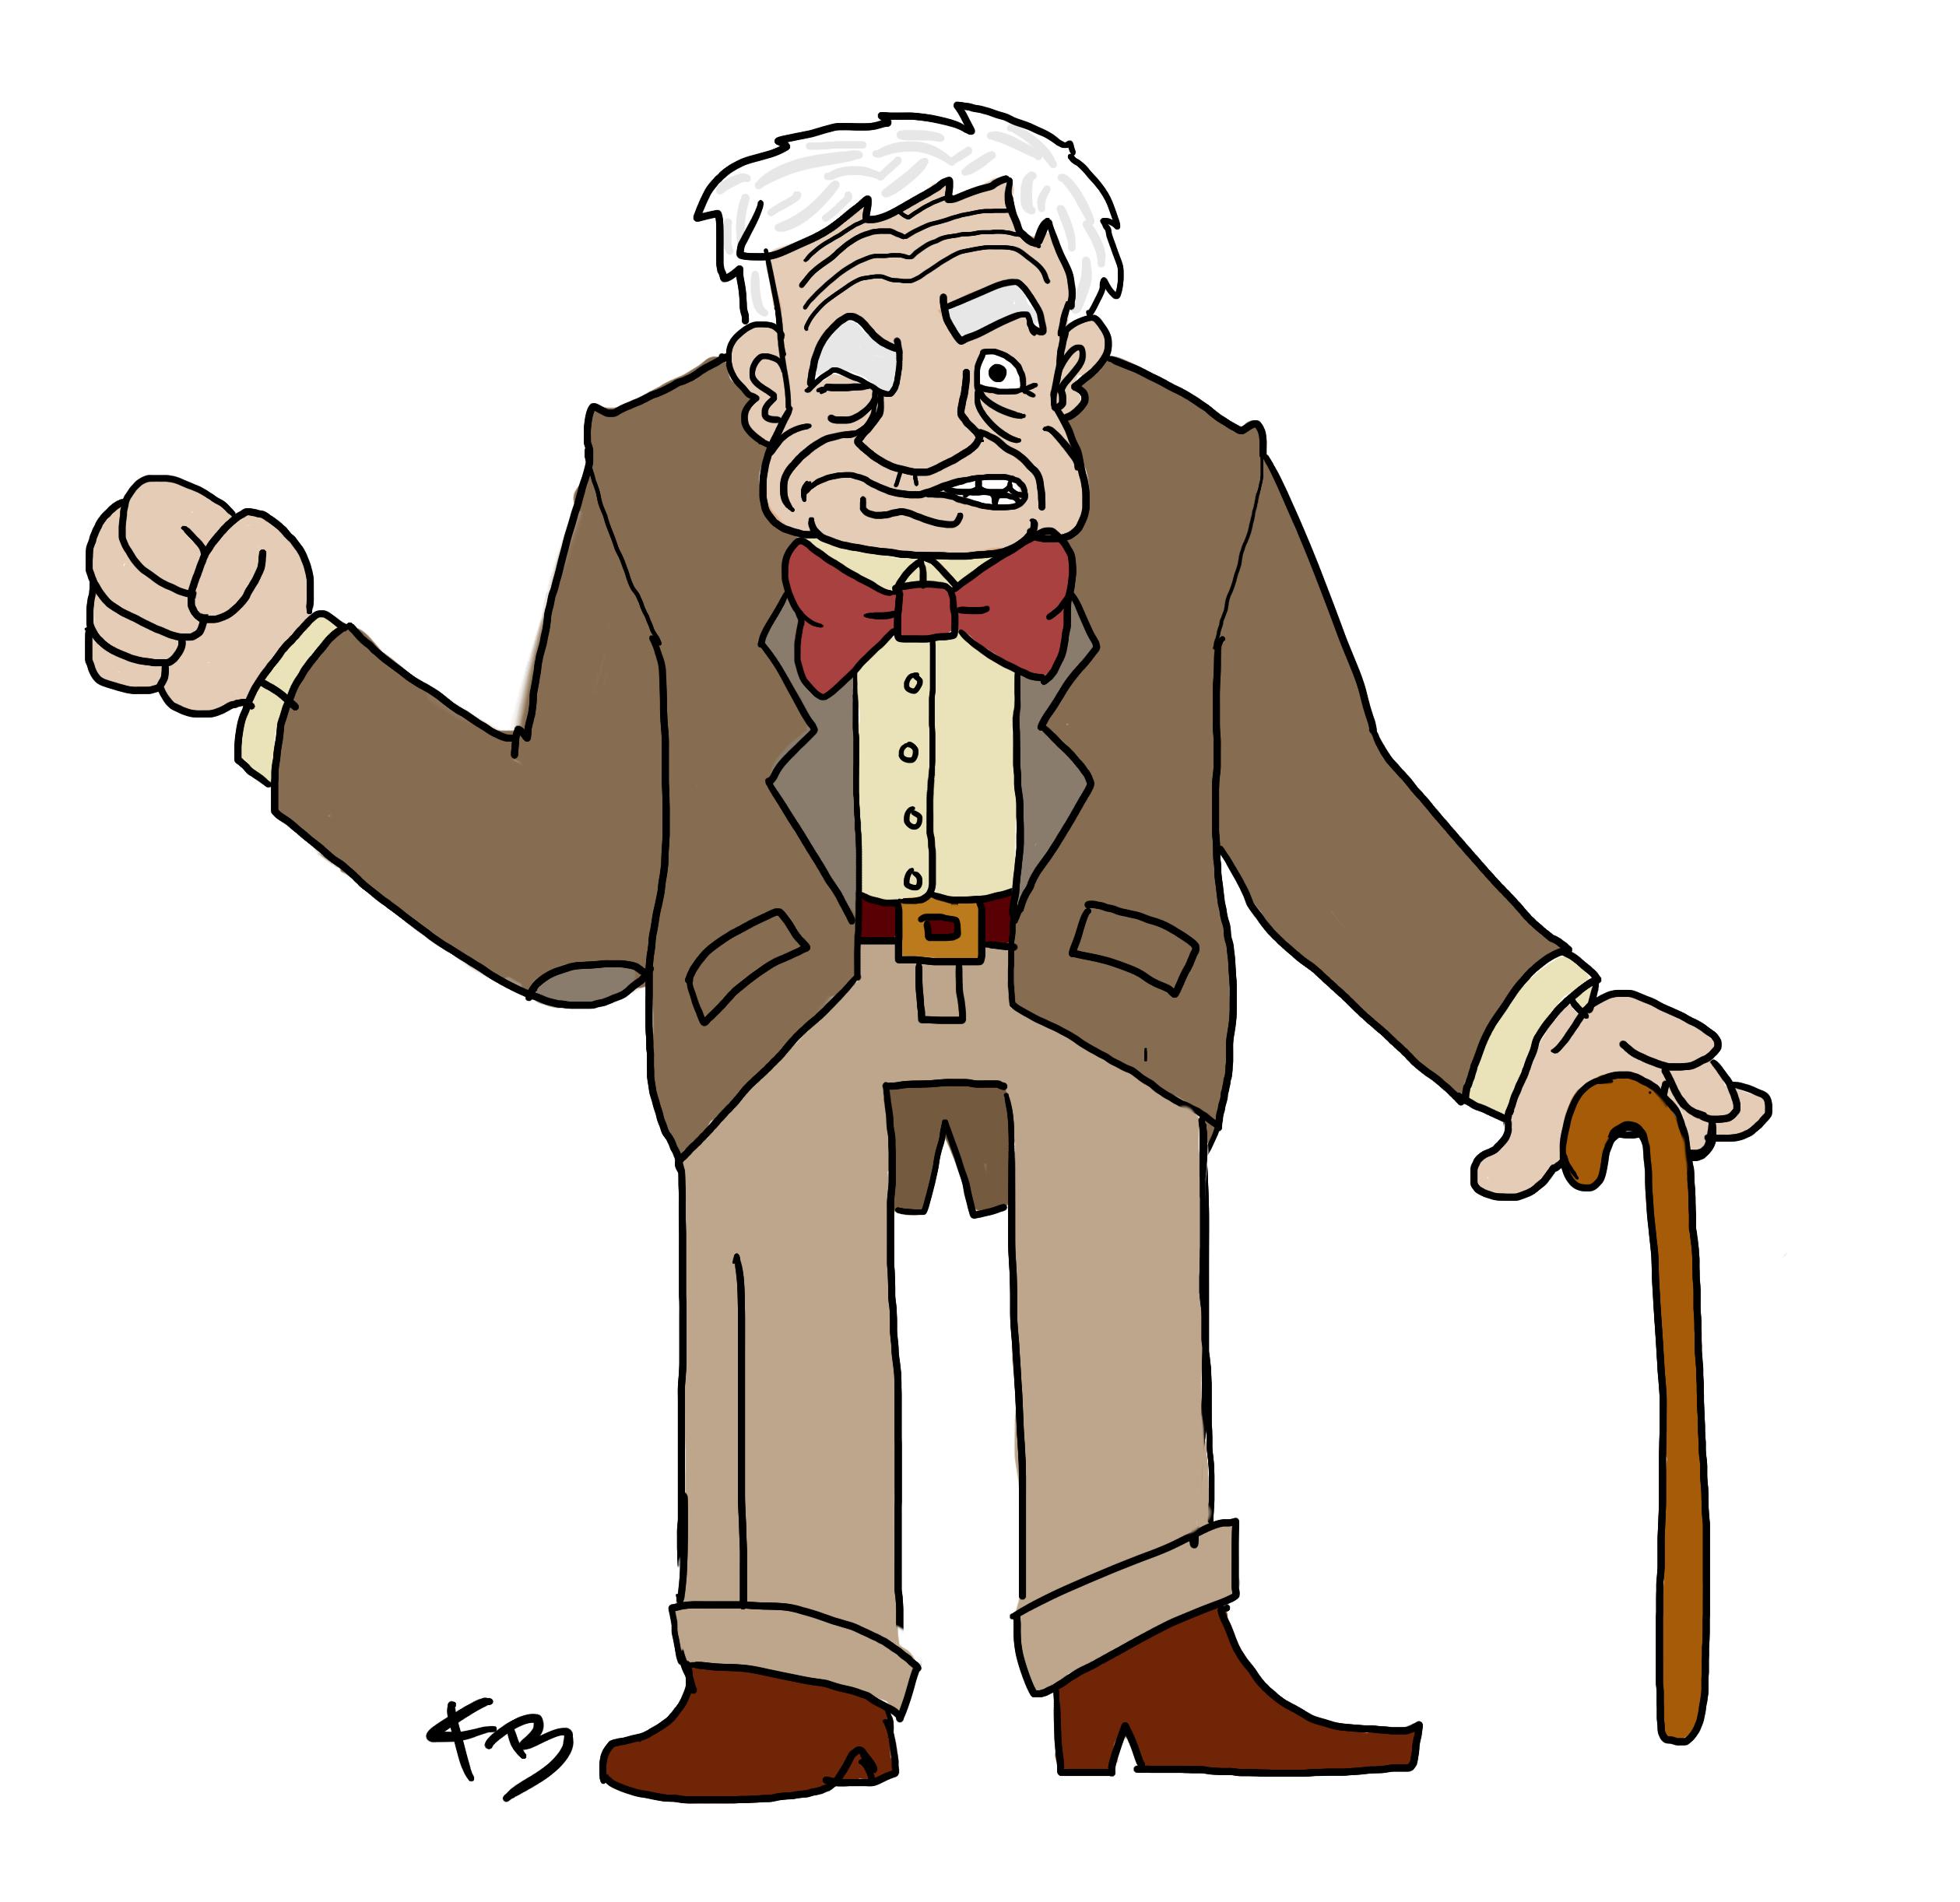 Grumpy Old Men Cartoon Grumpy old man now inGrumpy Old Man Cartoon Face